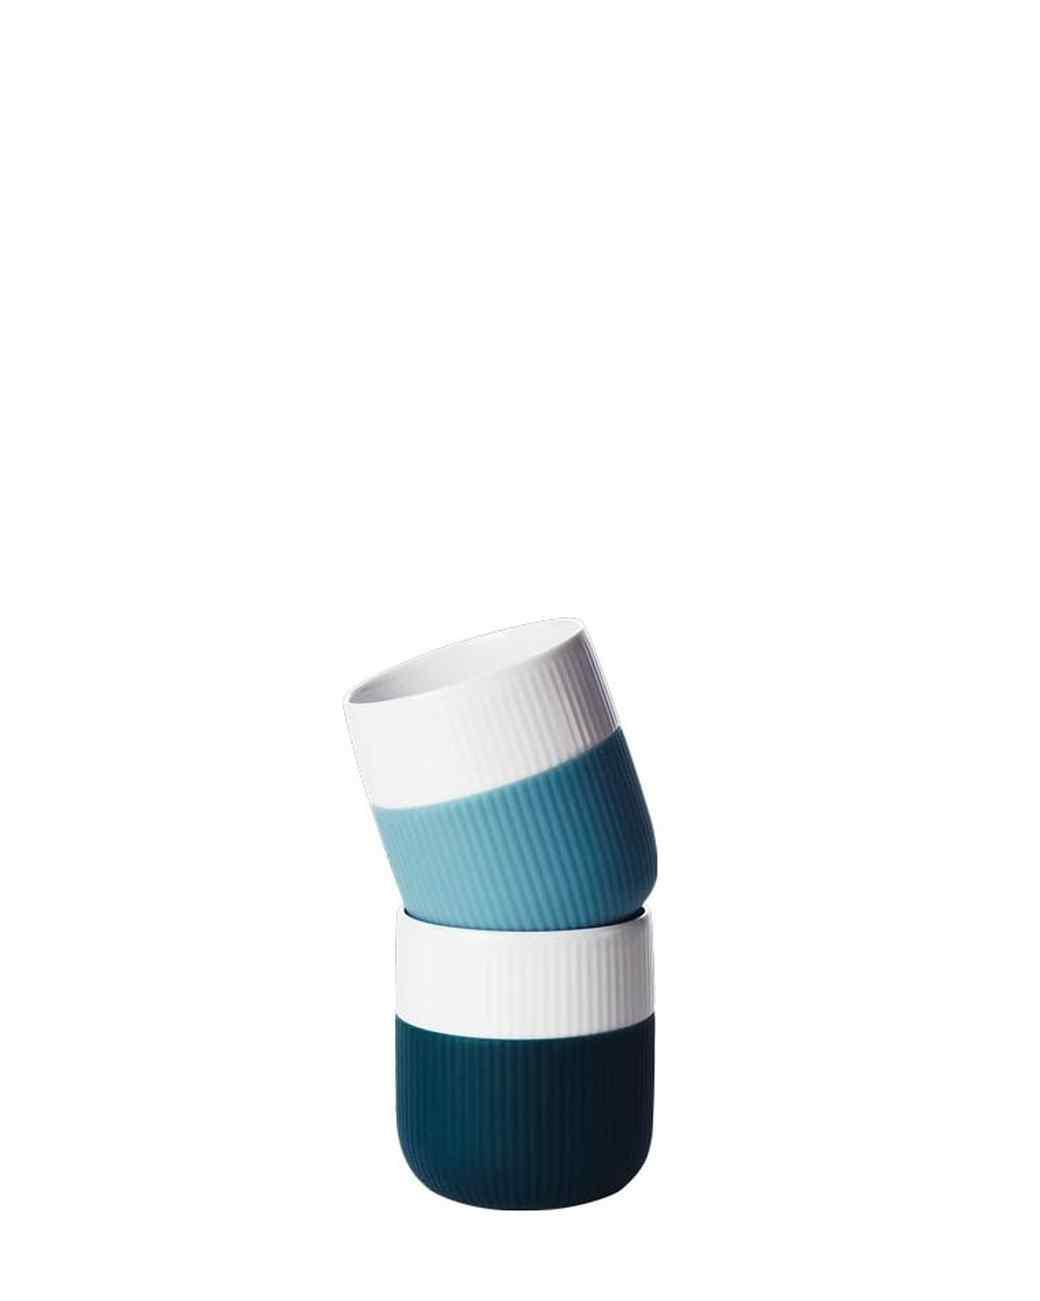 cups-224-d112685-0216.jpg